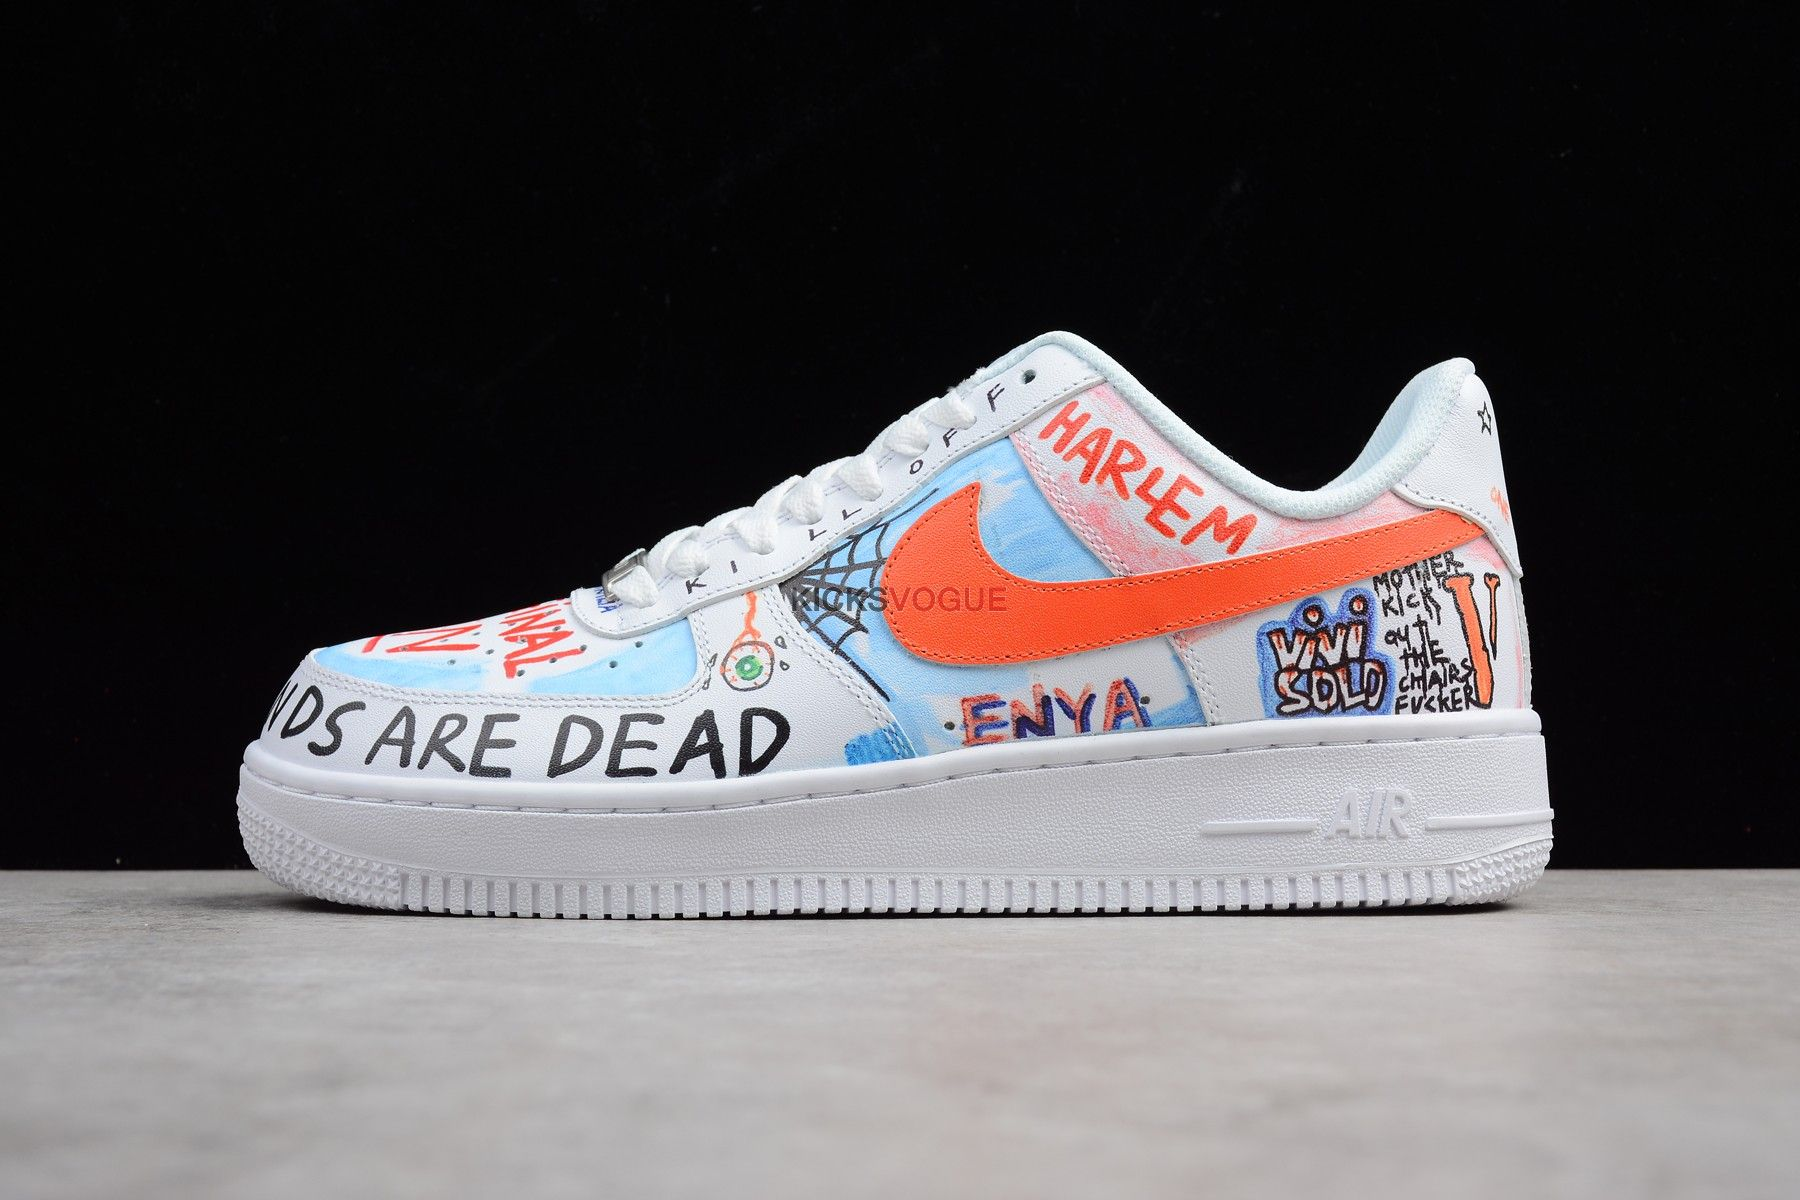 "PAULY VLONE x Nike Air Force 1 LOW WHITE ""Mase</p>                 <!--bof Quantity Discounts table -->                                 <!--eof Quantity Discounts table -->                  <!--bof Product URL -->                                 <!--eof Product URL -->             </div>             <div id="